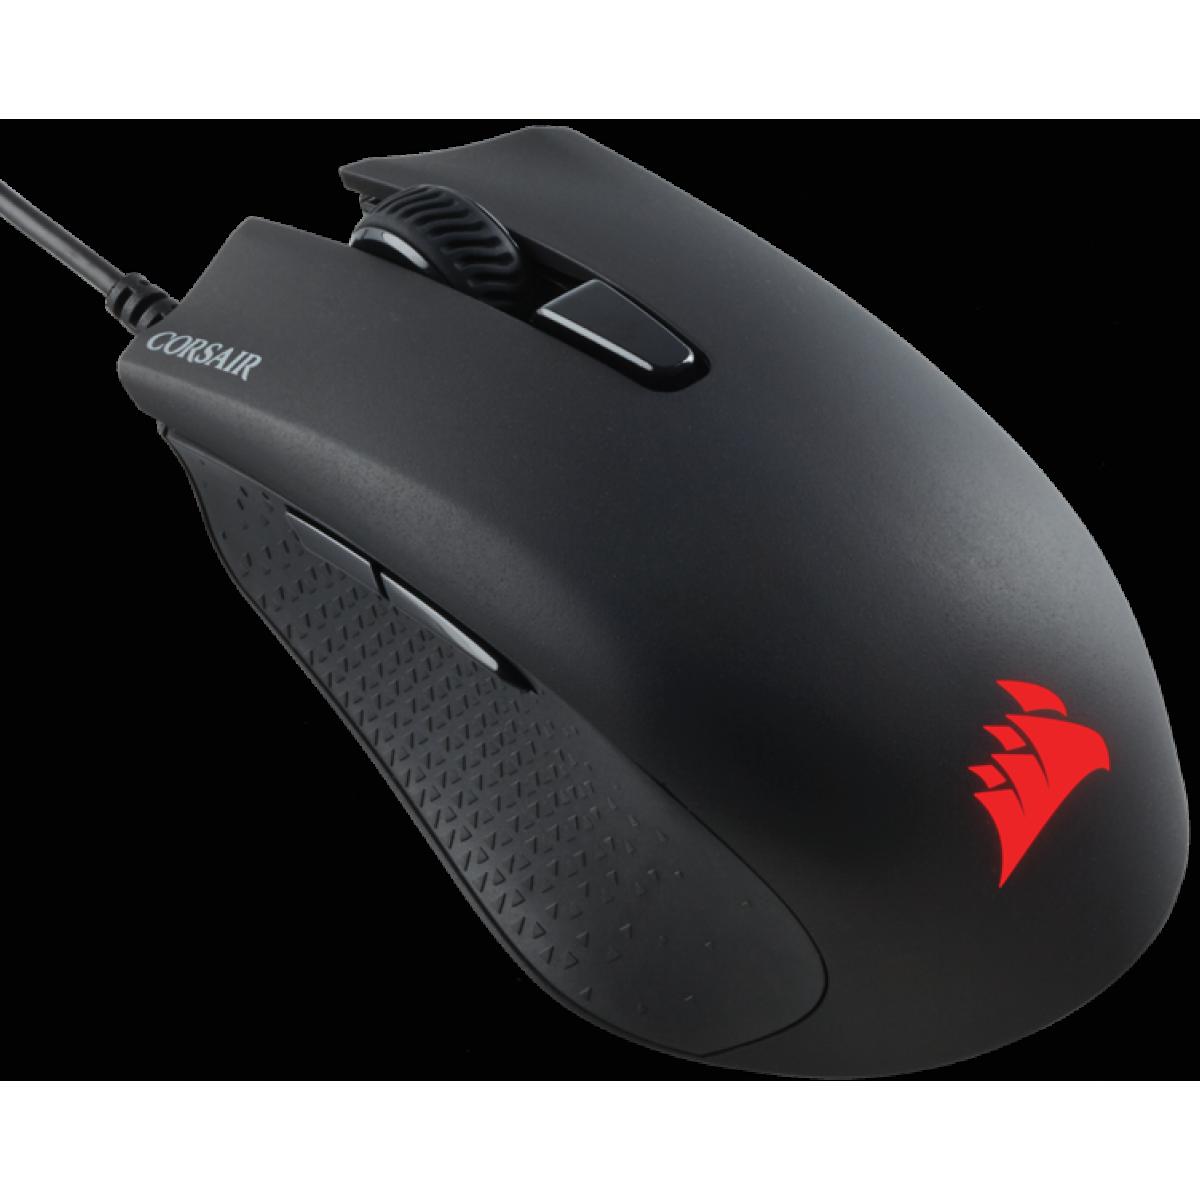 Mouse Corsair Gamer Harpoon CH-9301011-NA RGB 6 Botões 6000 DPI Preto